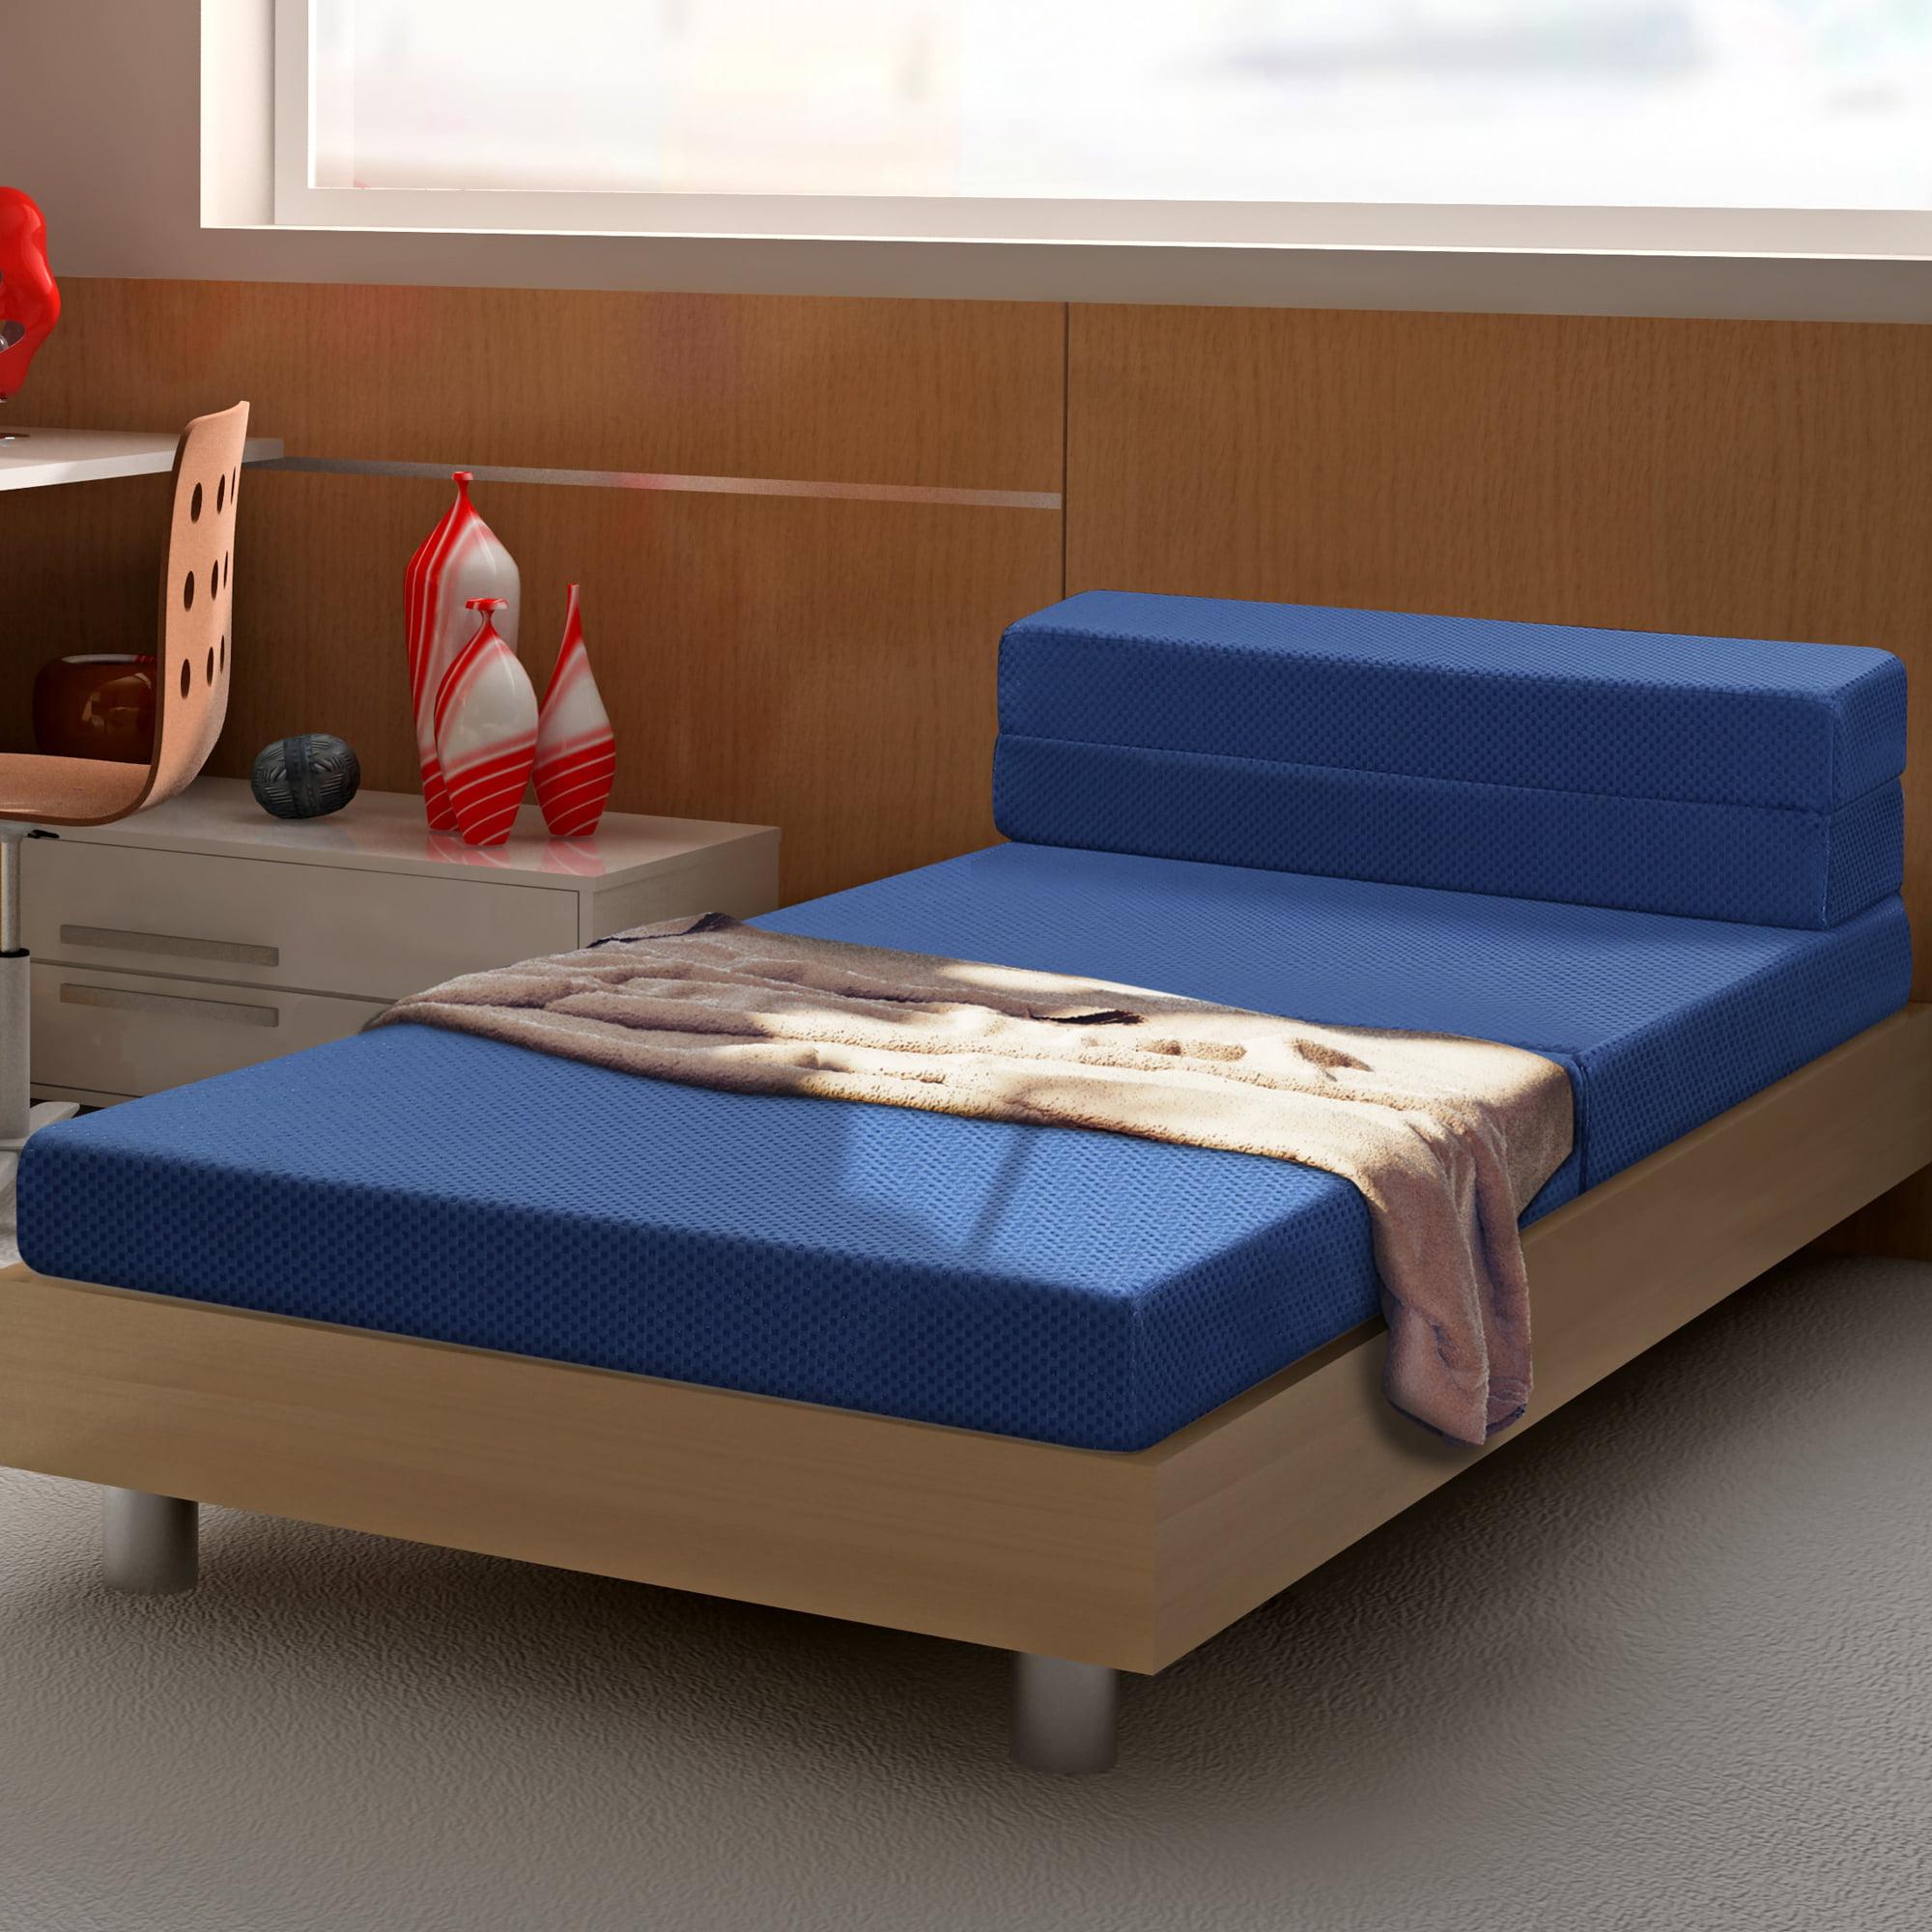 GranRest 4'' Folding Portable Mattress, Gel Memory Foam / Sofa Bed